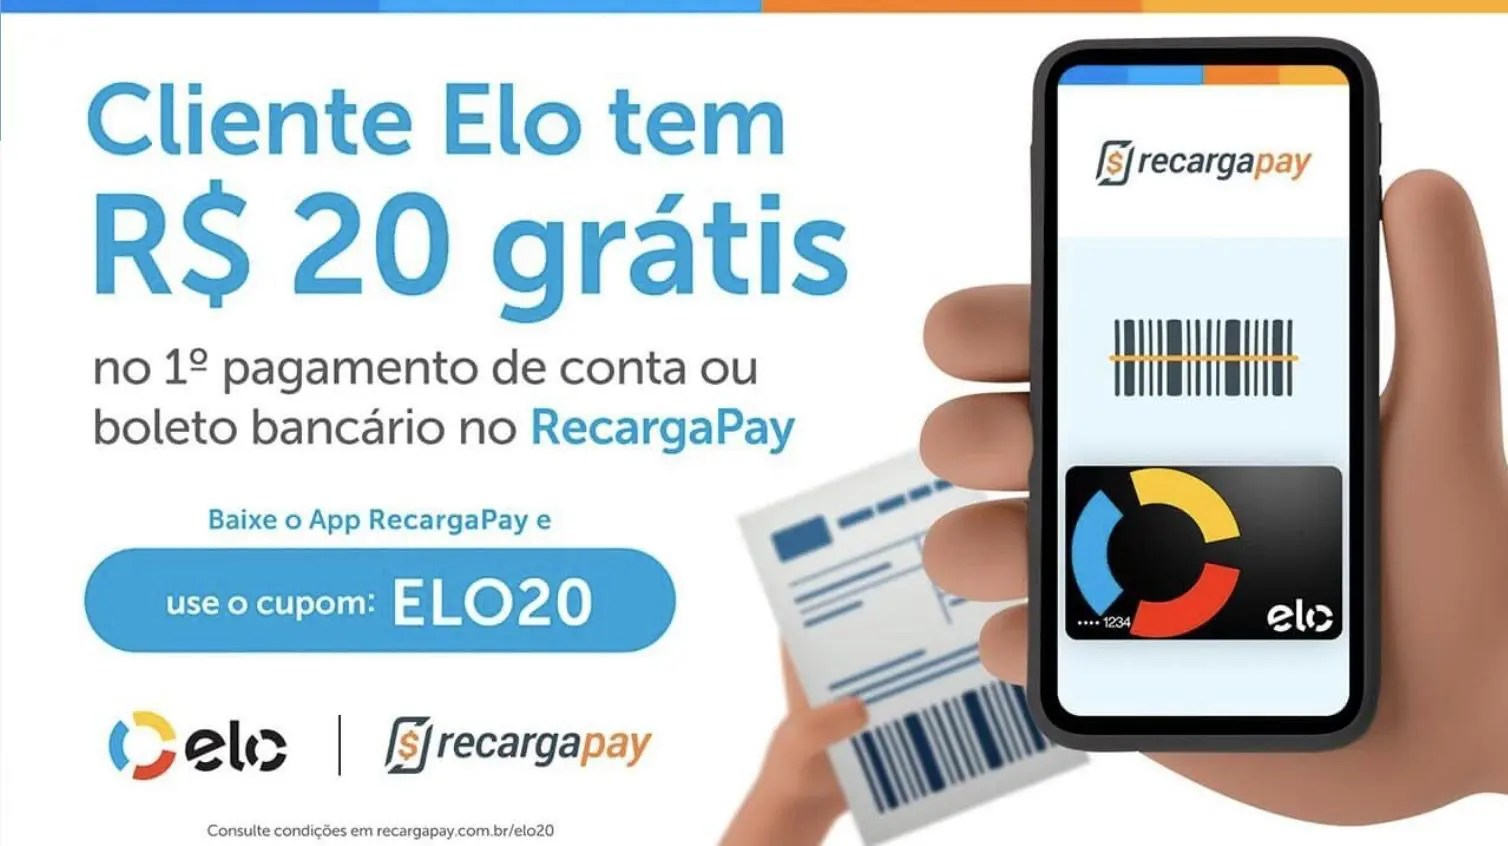 Elo RecargaPay